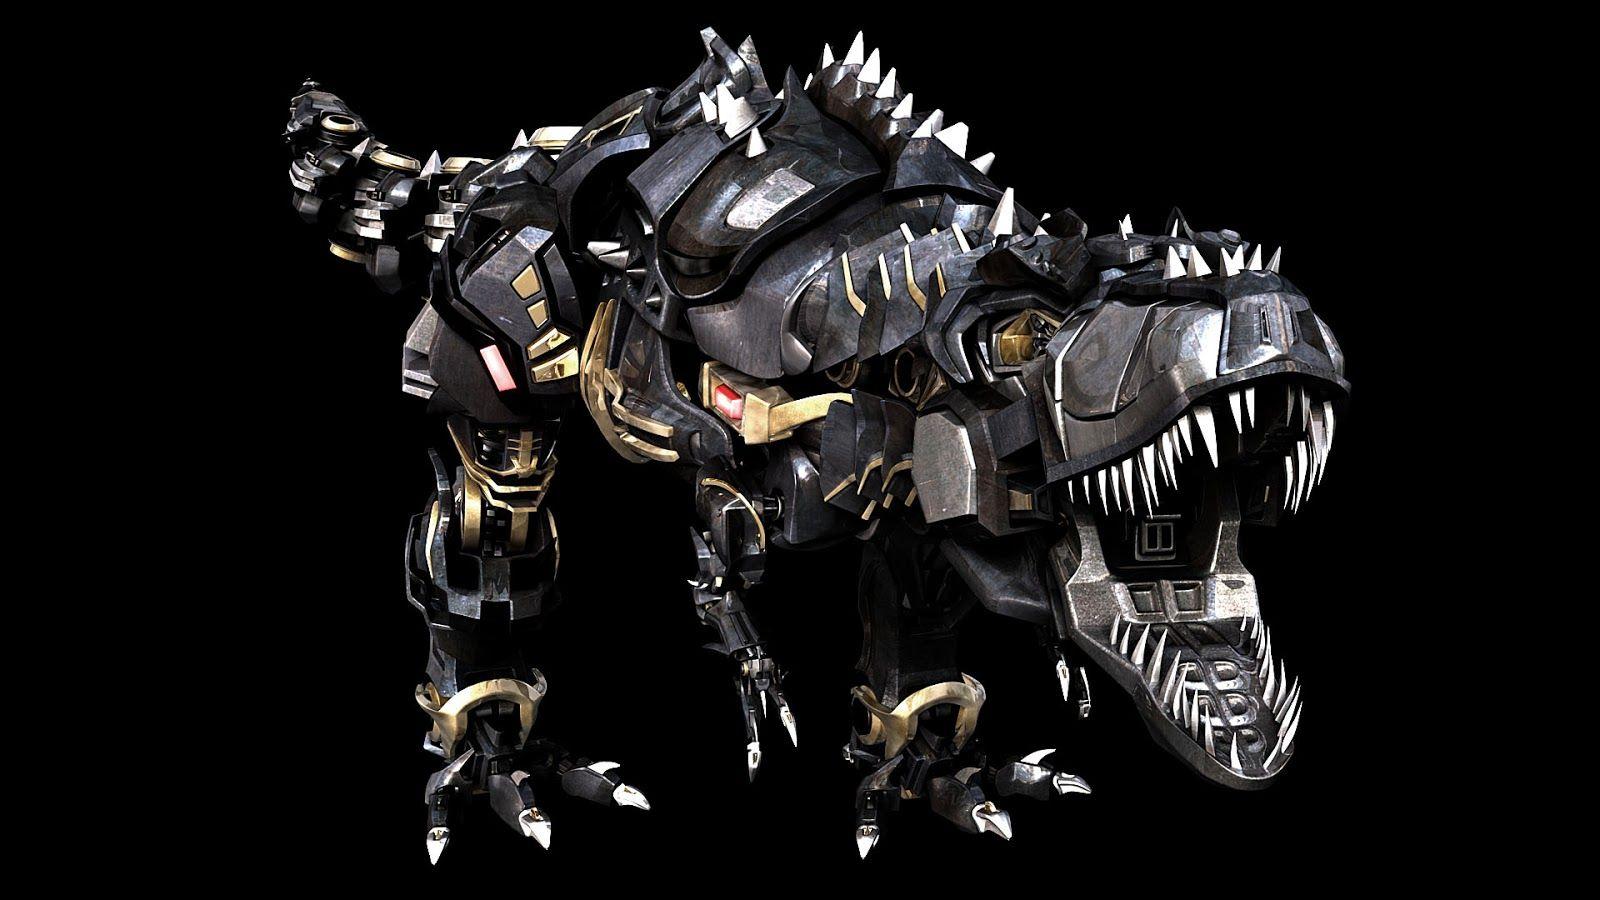 Transformers Fan Made Grimlock 3D Puter Model 이미지 ¬•¨